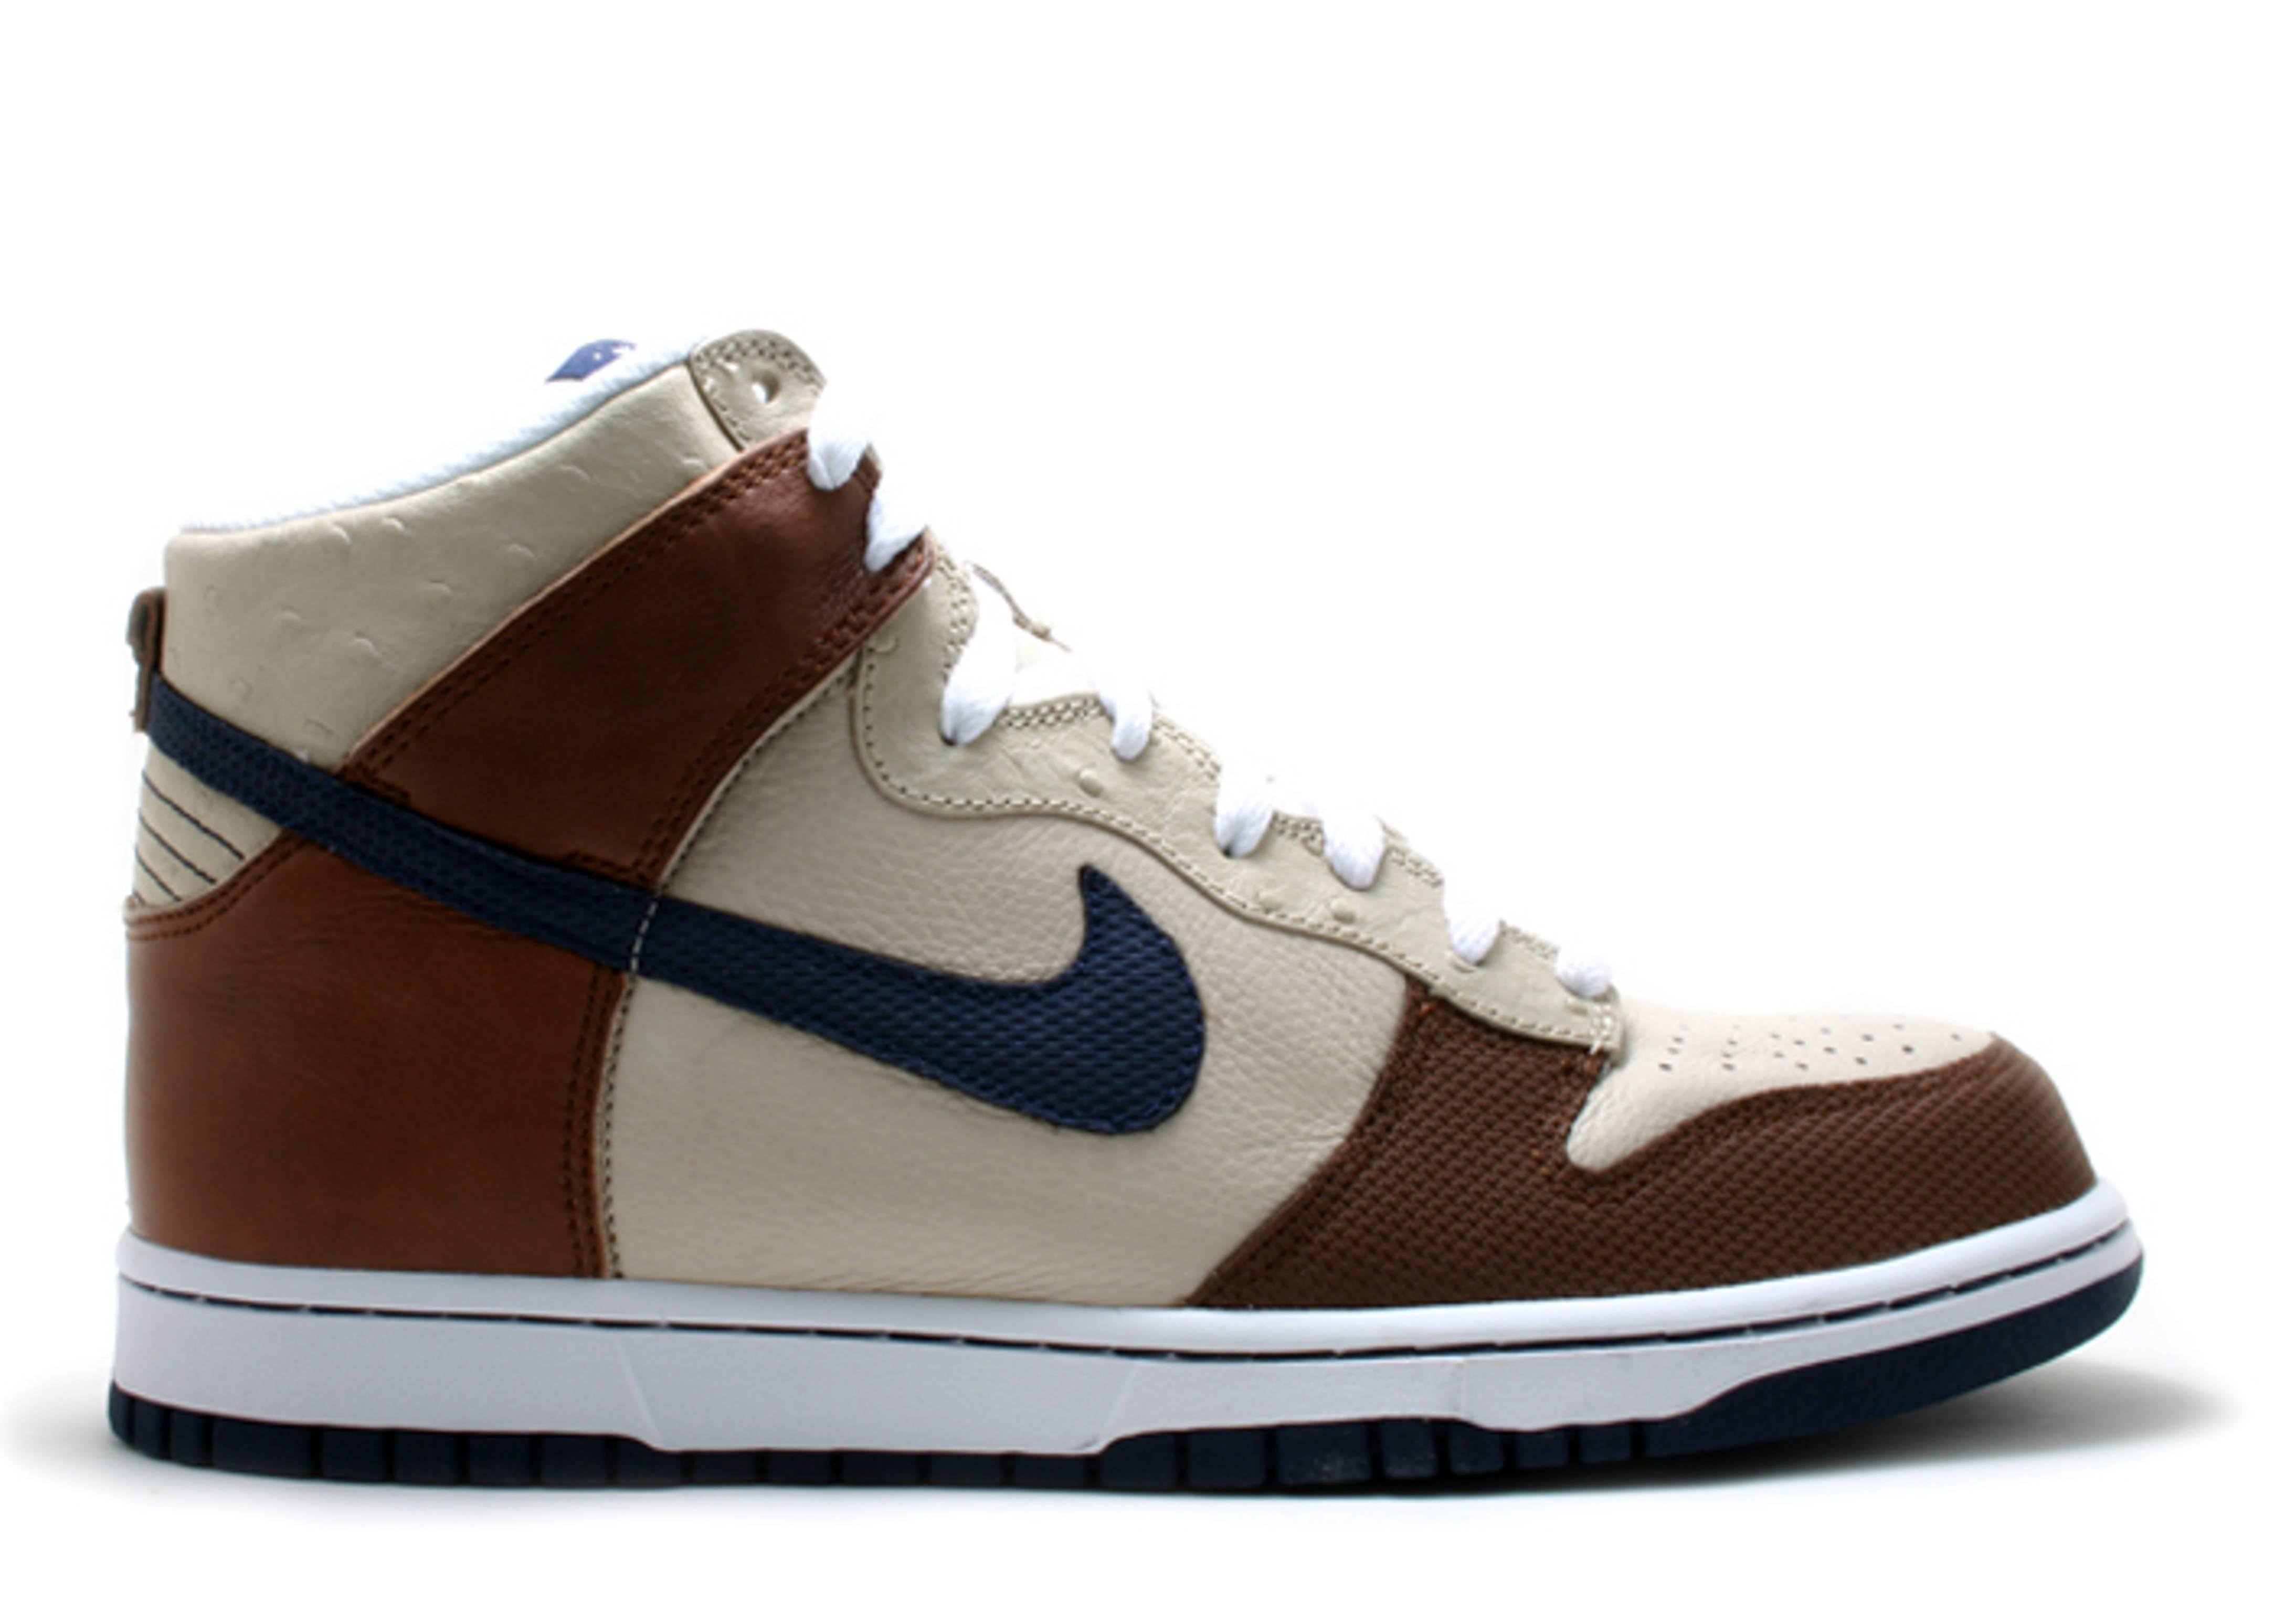 promo code 410ec 08649 Dunk High Premium - Nike - 316424 241 - rusticmidnight navy-sanddrift   Flight Club